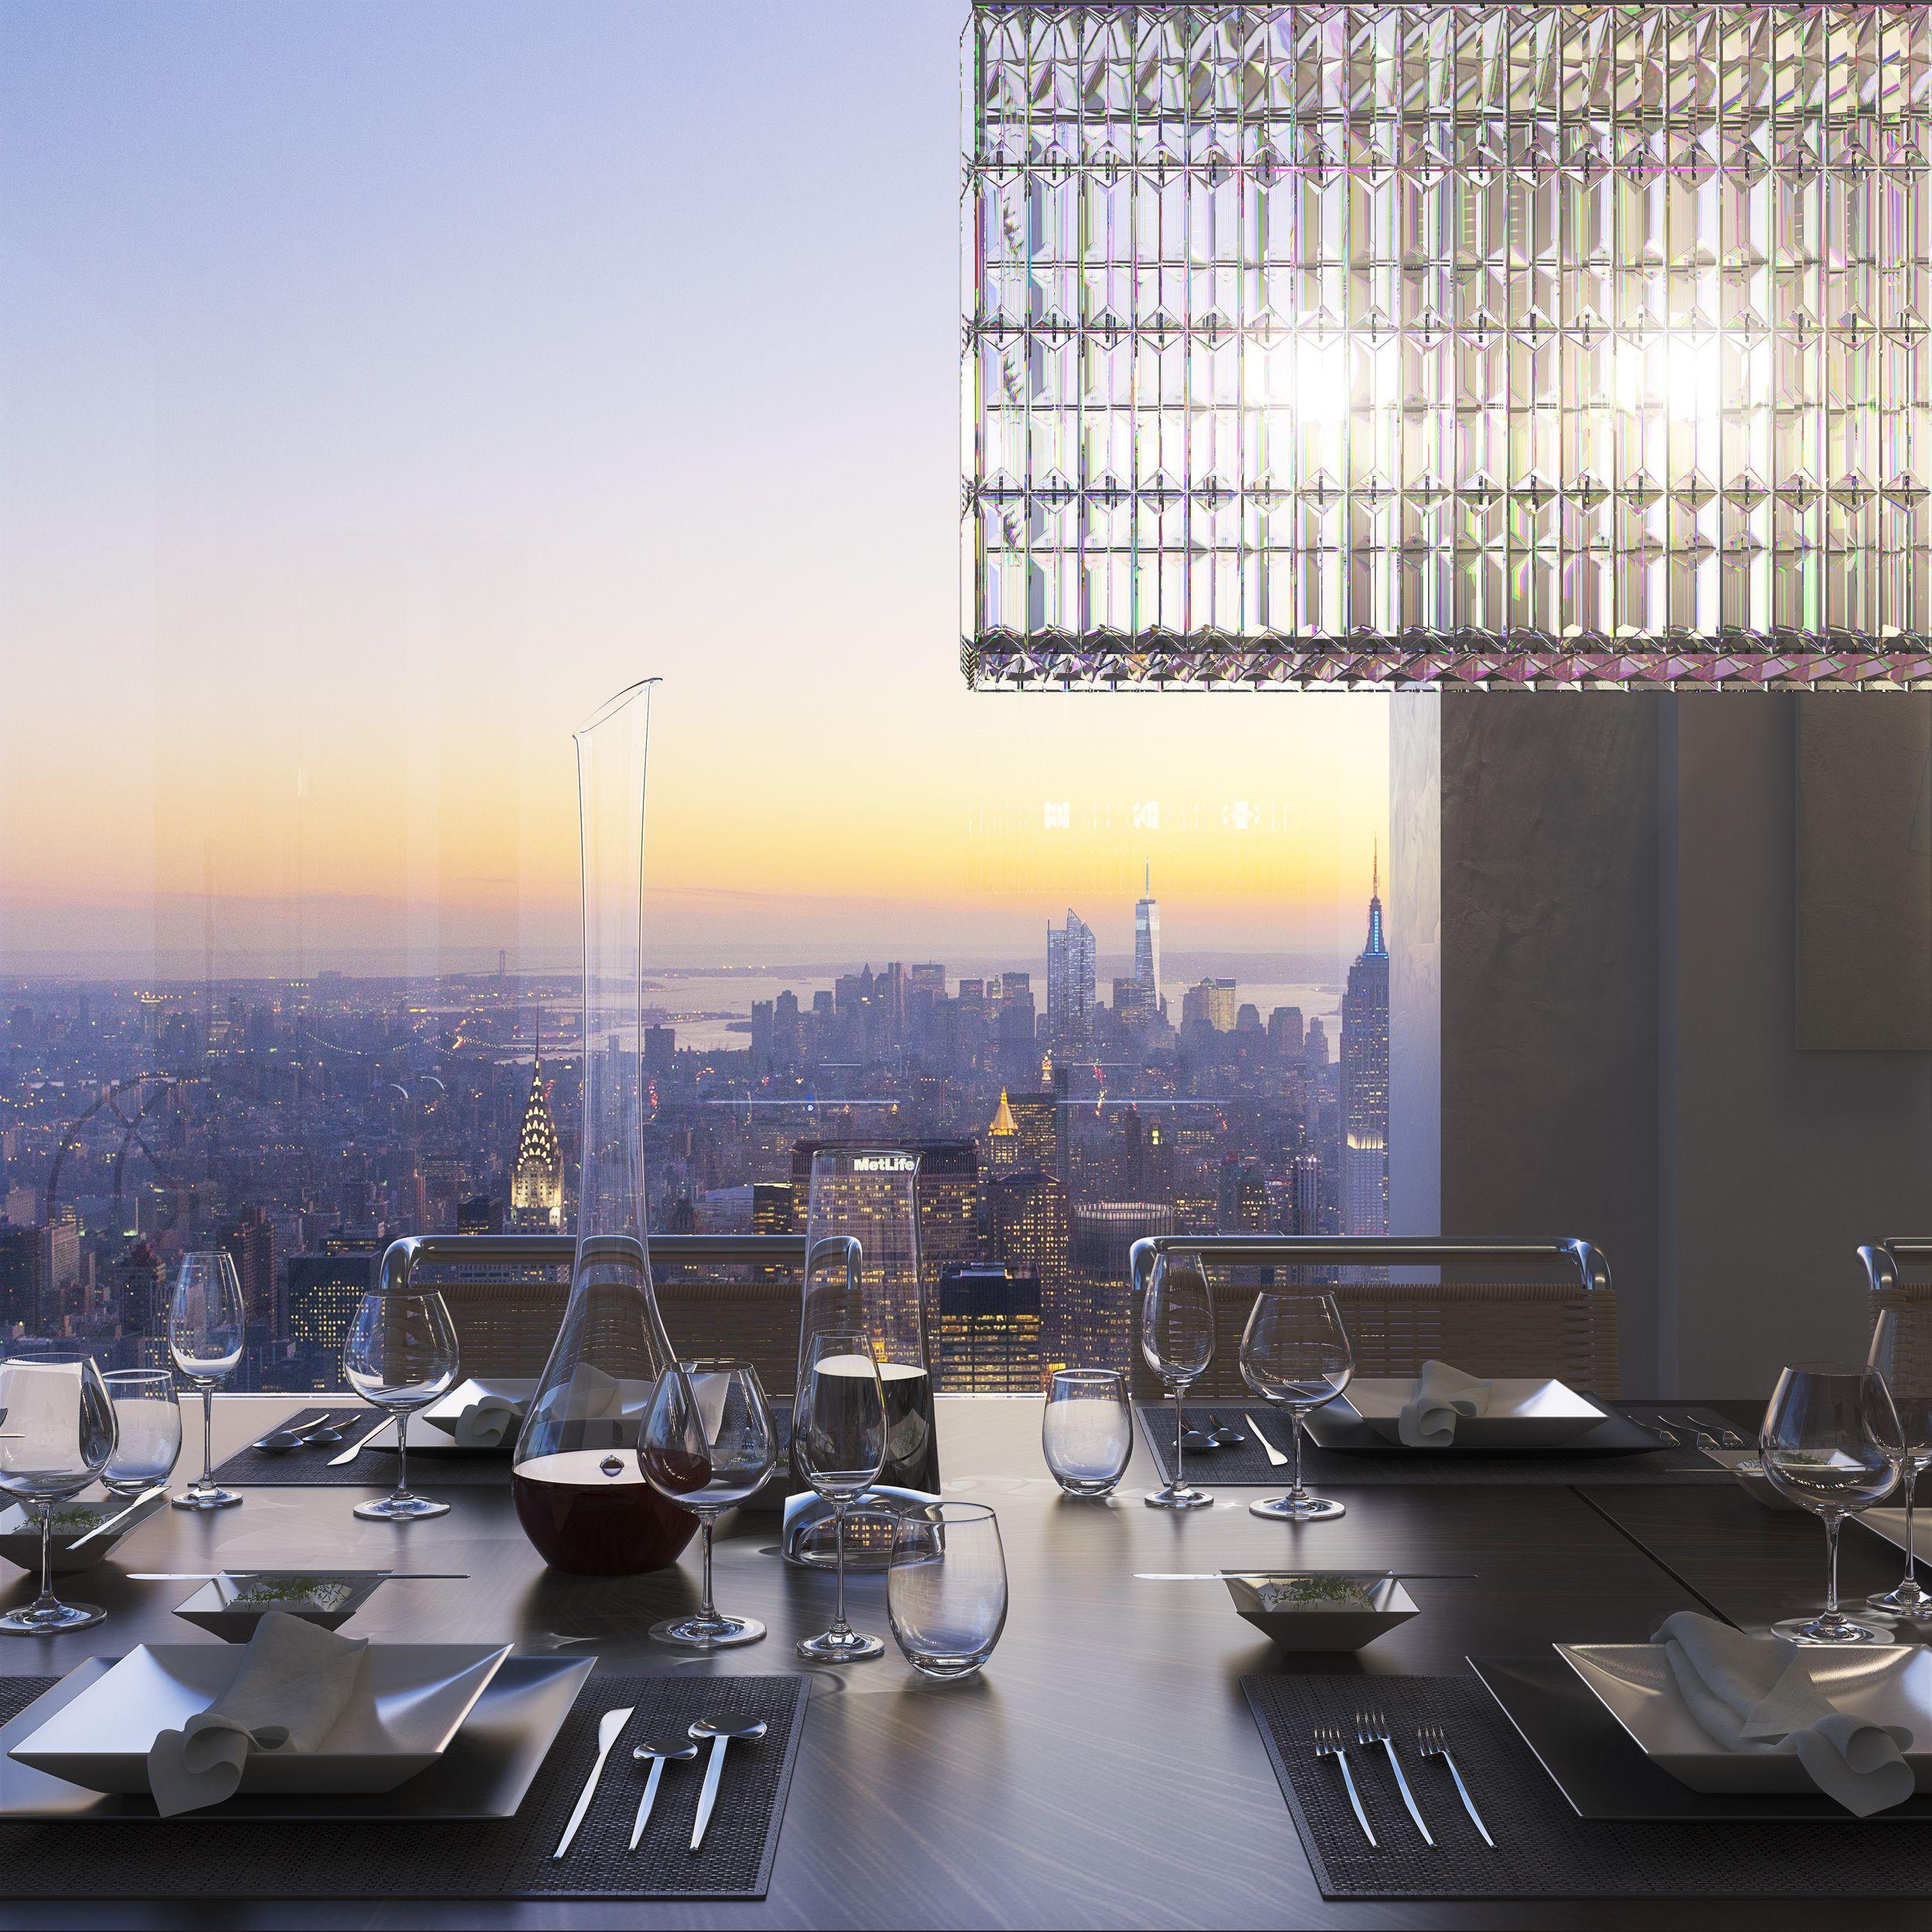 The Avenue By Executive Apartments: 432 Park Avenue Penthouse - Google 搜索